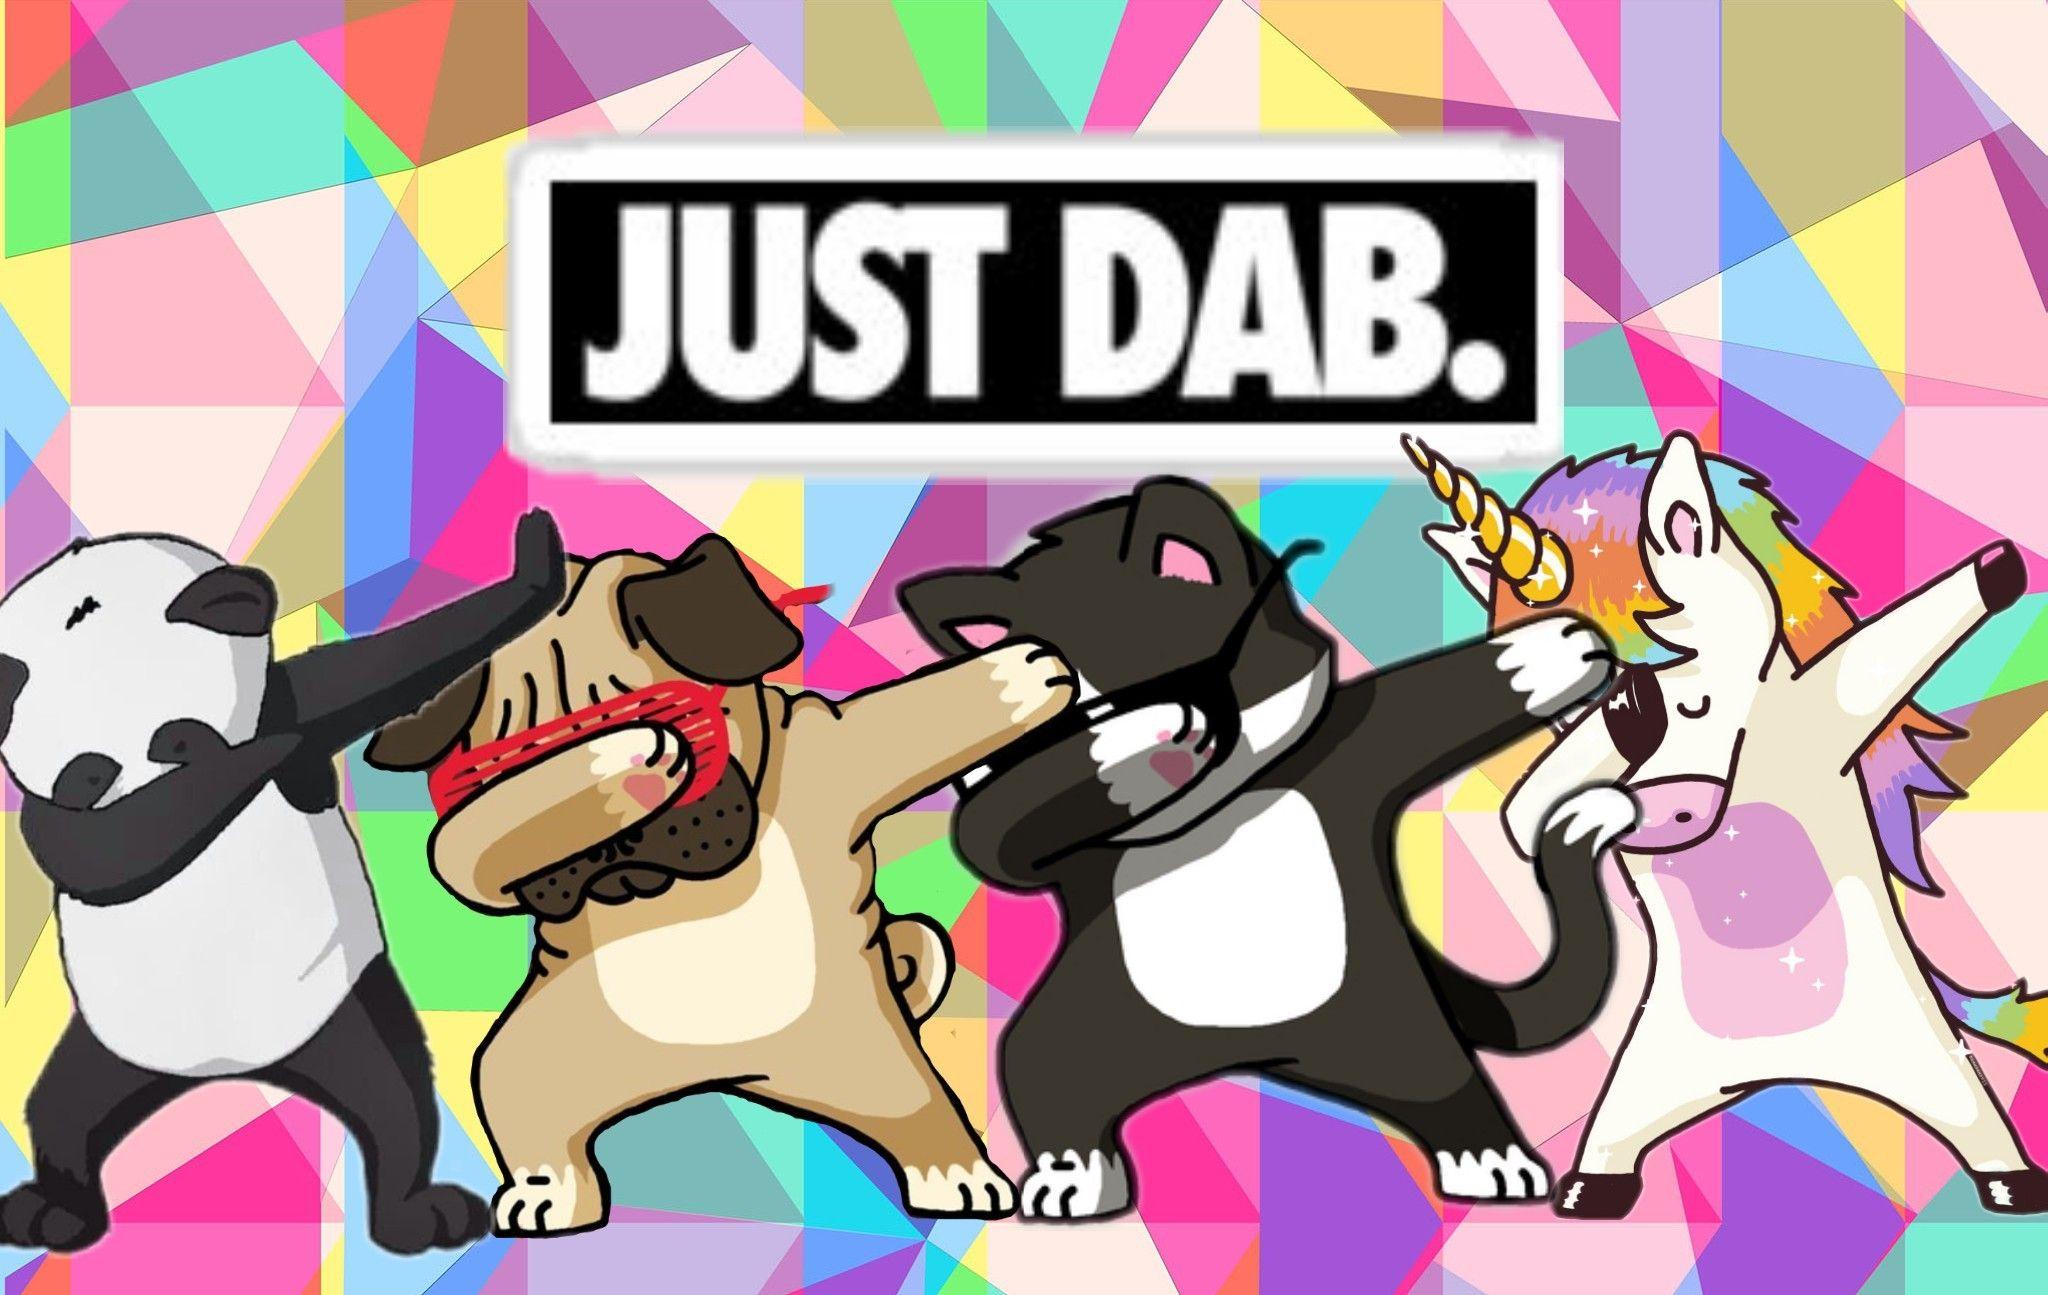 Freetoeditdab dabbing panda unicorn dog catremixed